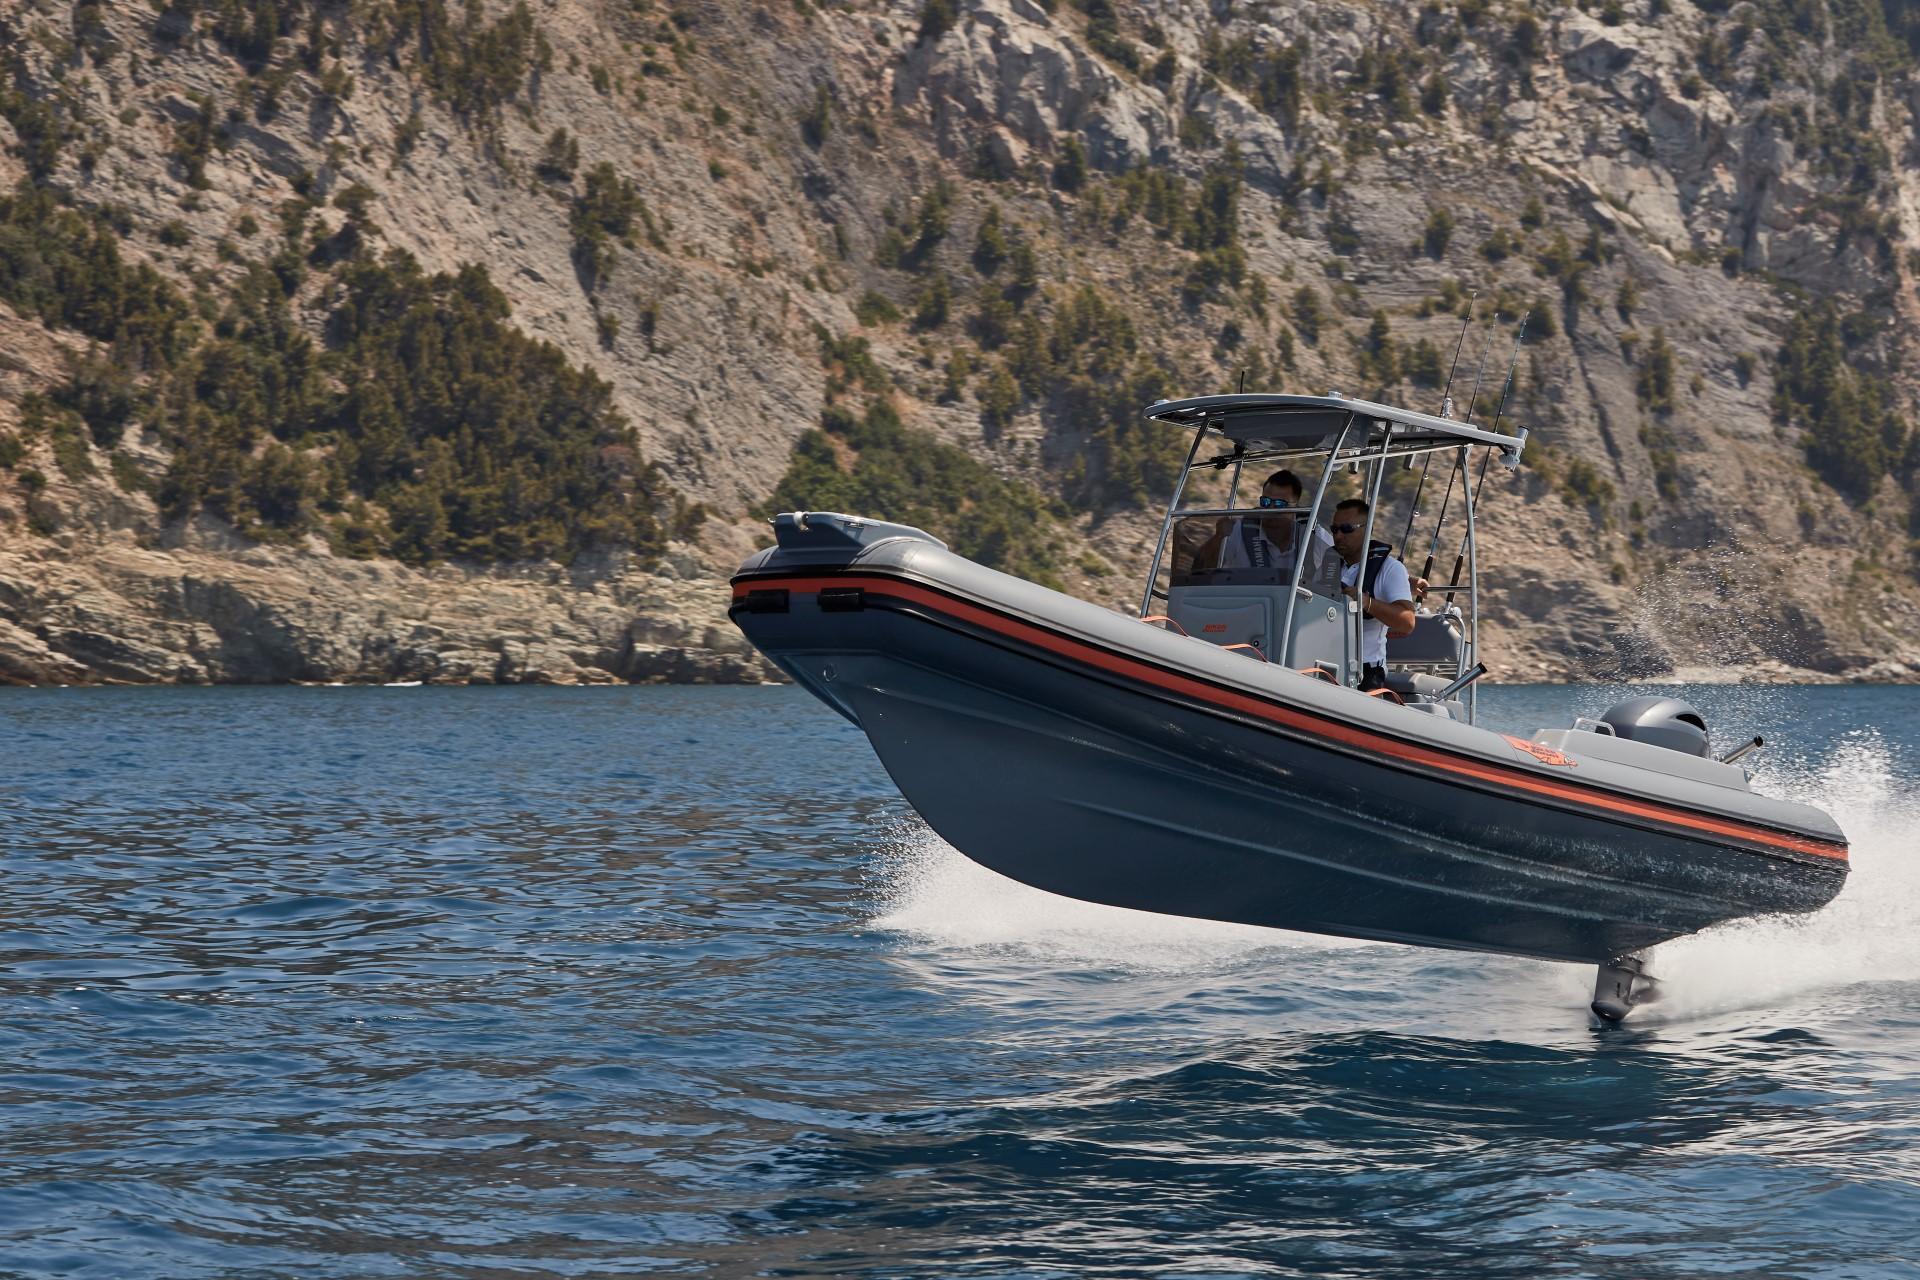 Joker Boat Barracuda jump